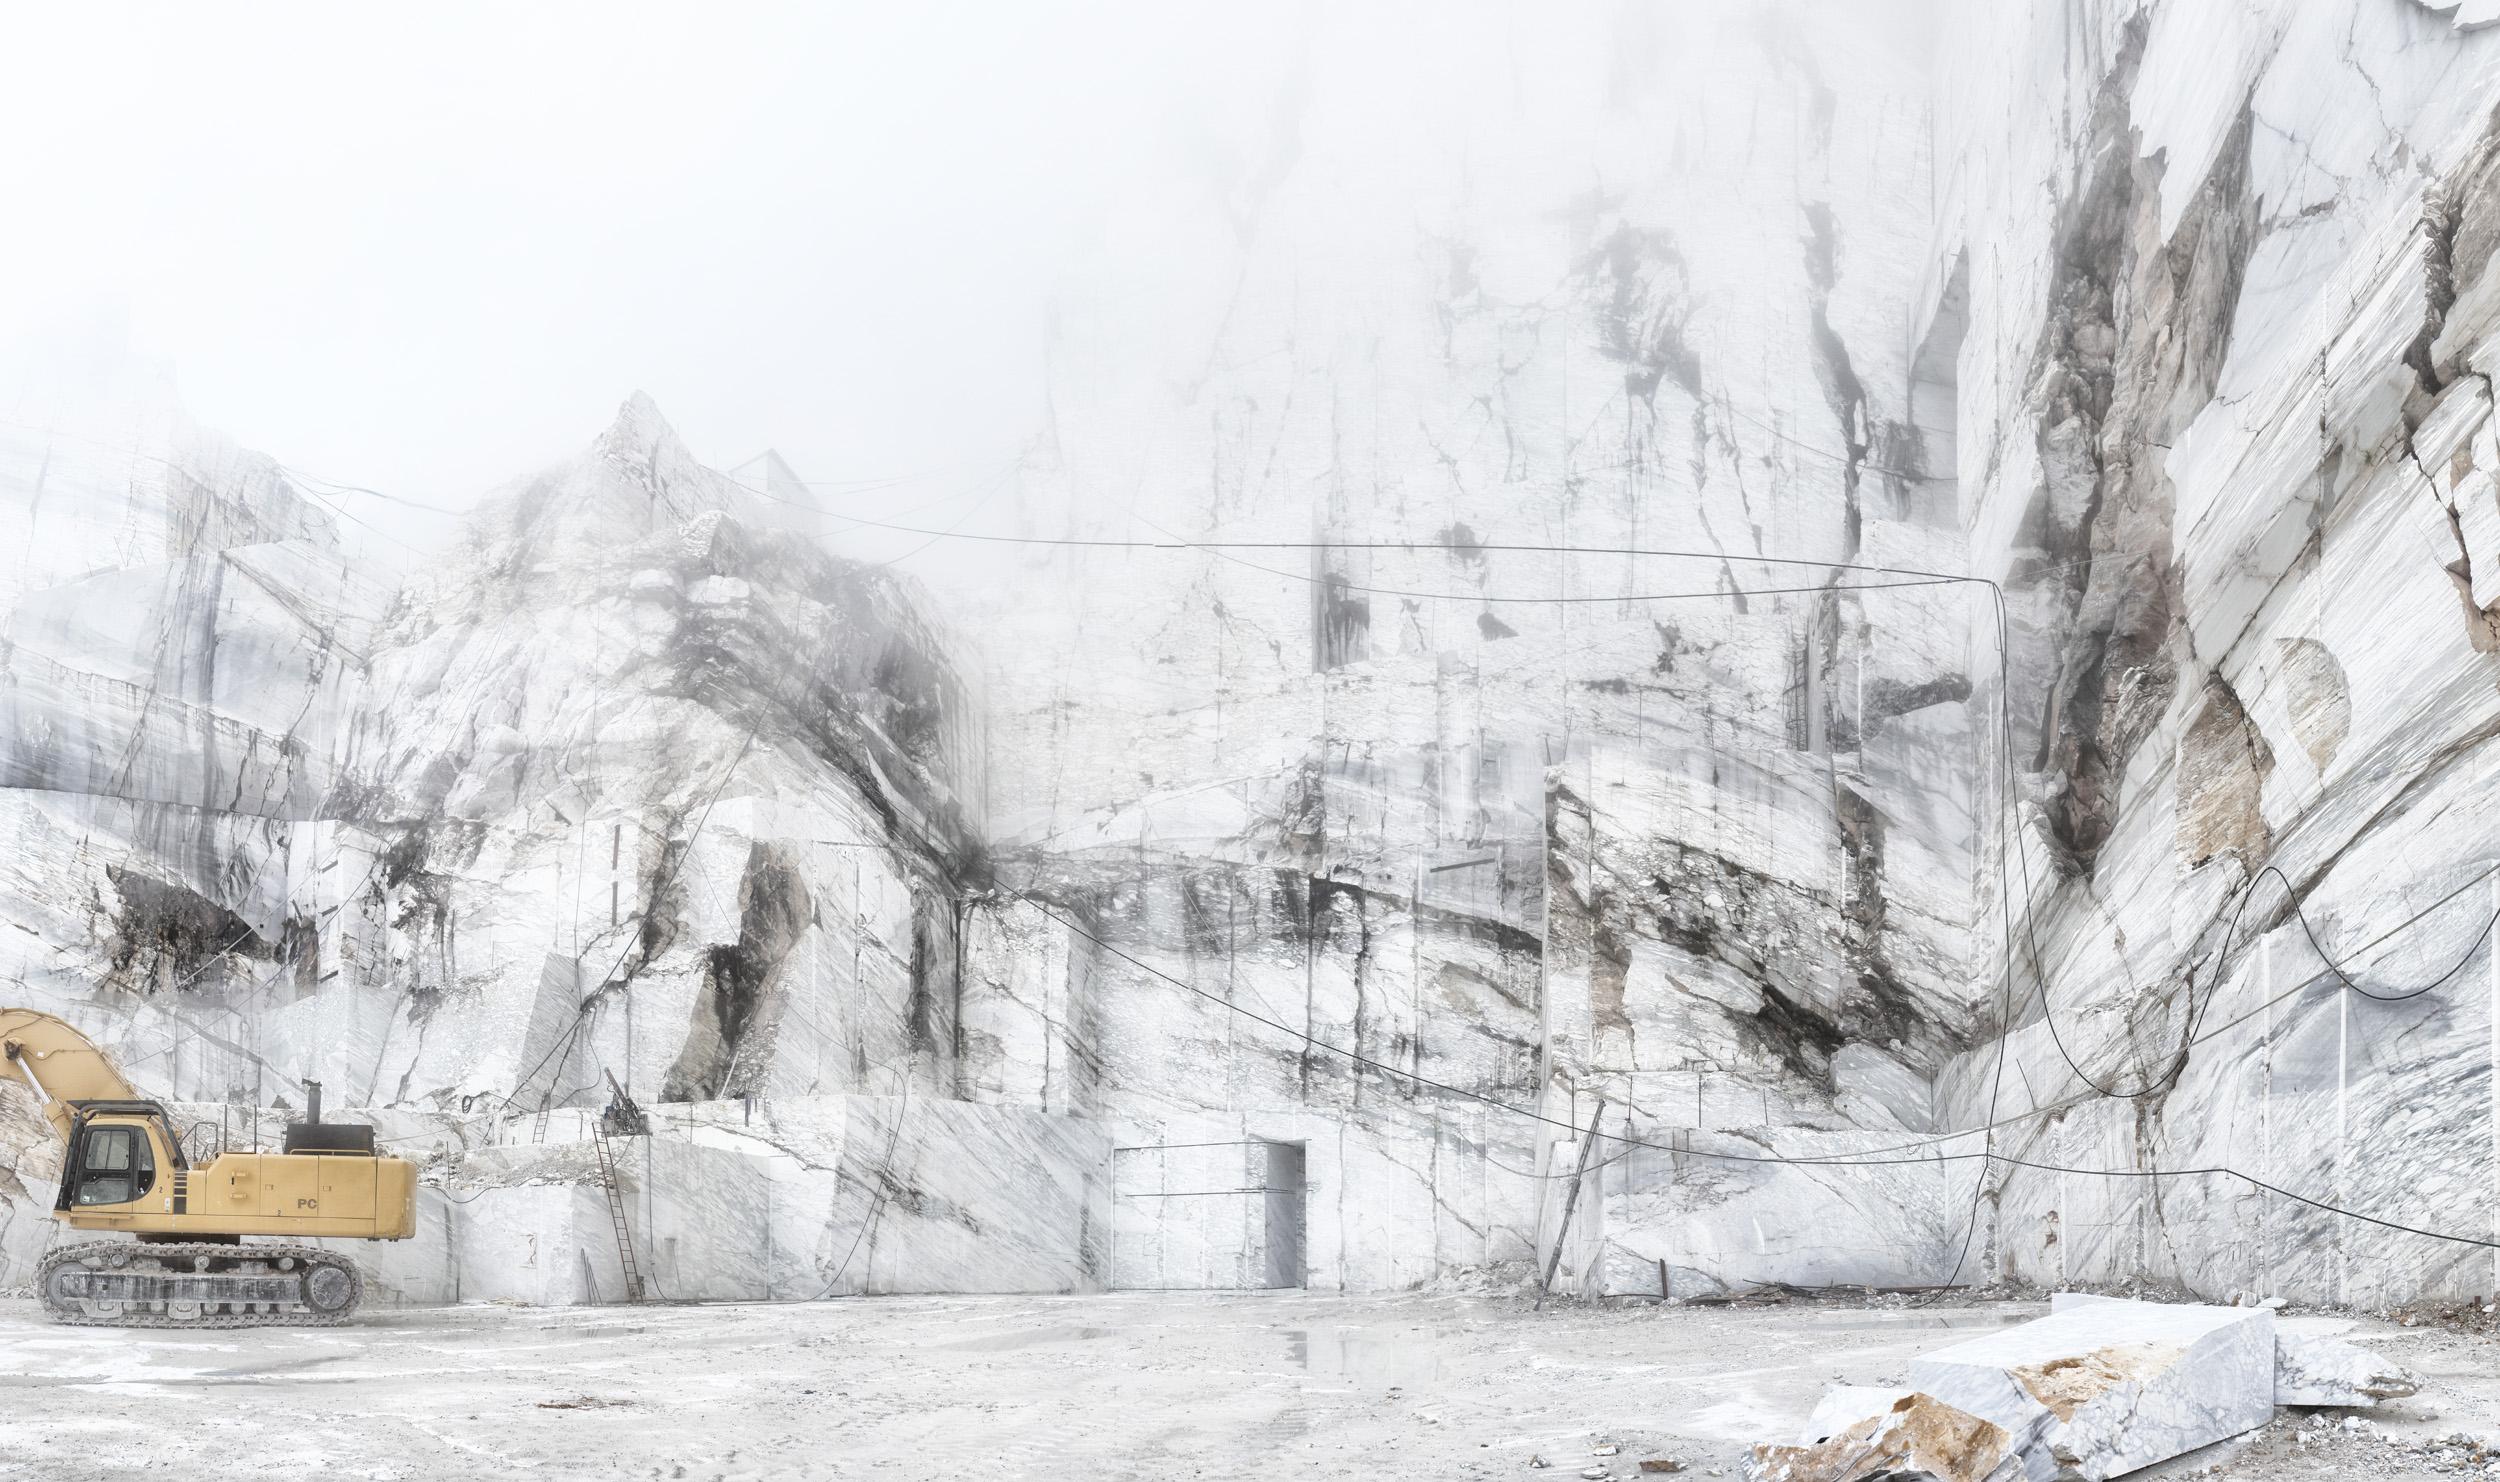 Tavolini III - Carrara, Italy 2015